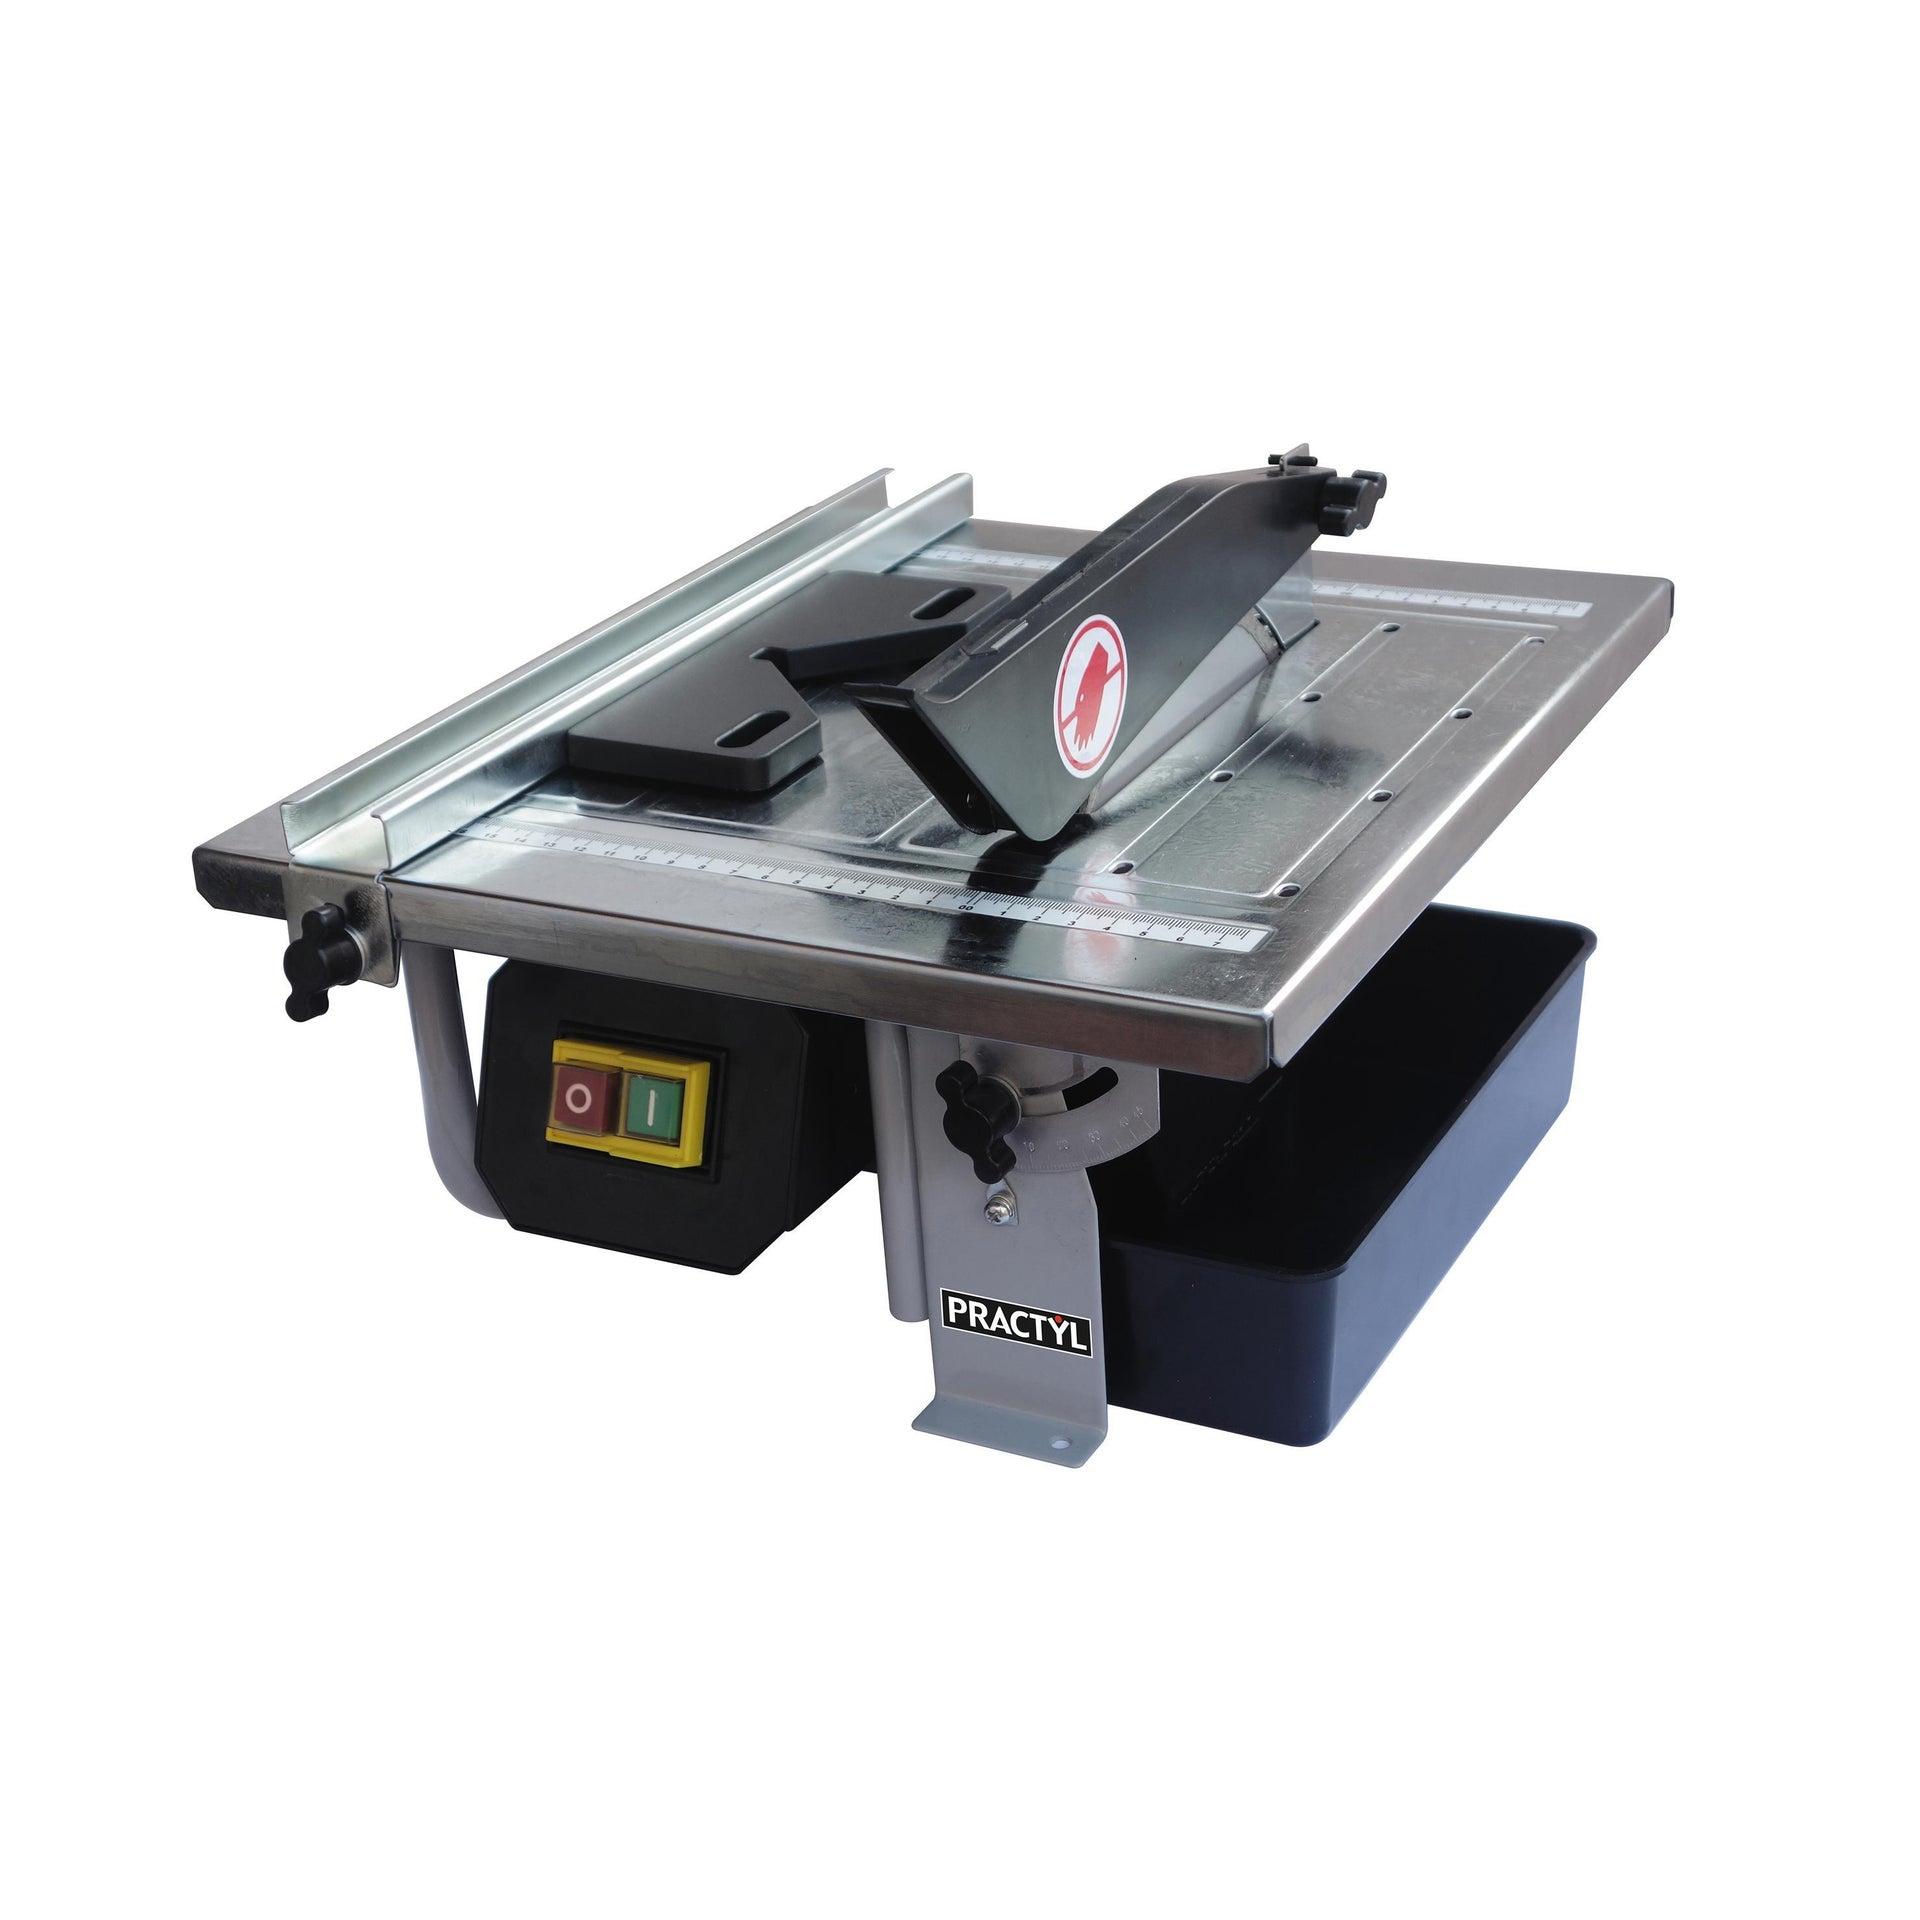 Tagliapiastrelle elettrica PRACTYL Ø disco 180.0 mm, H taglio 33.0 mm, 600.0 W - 1